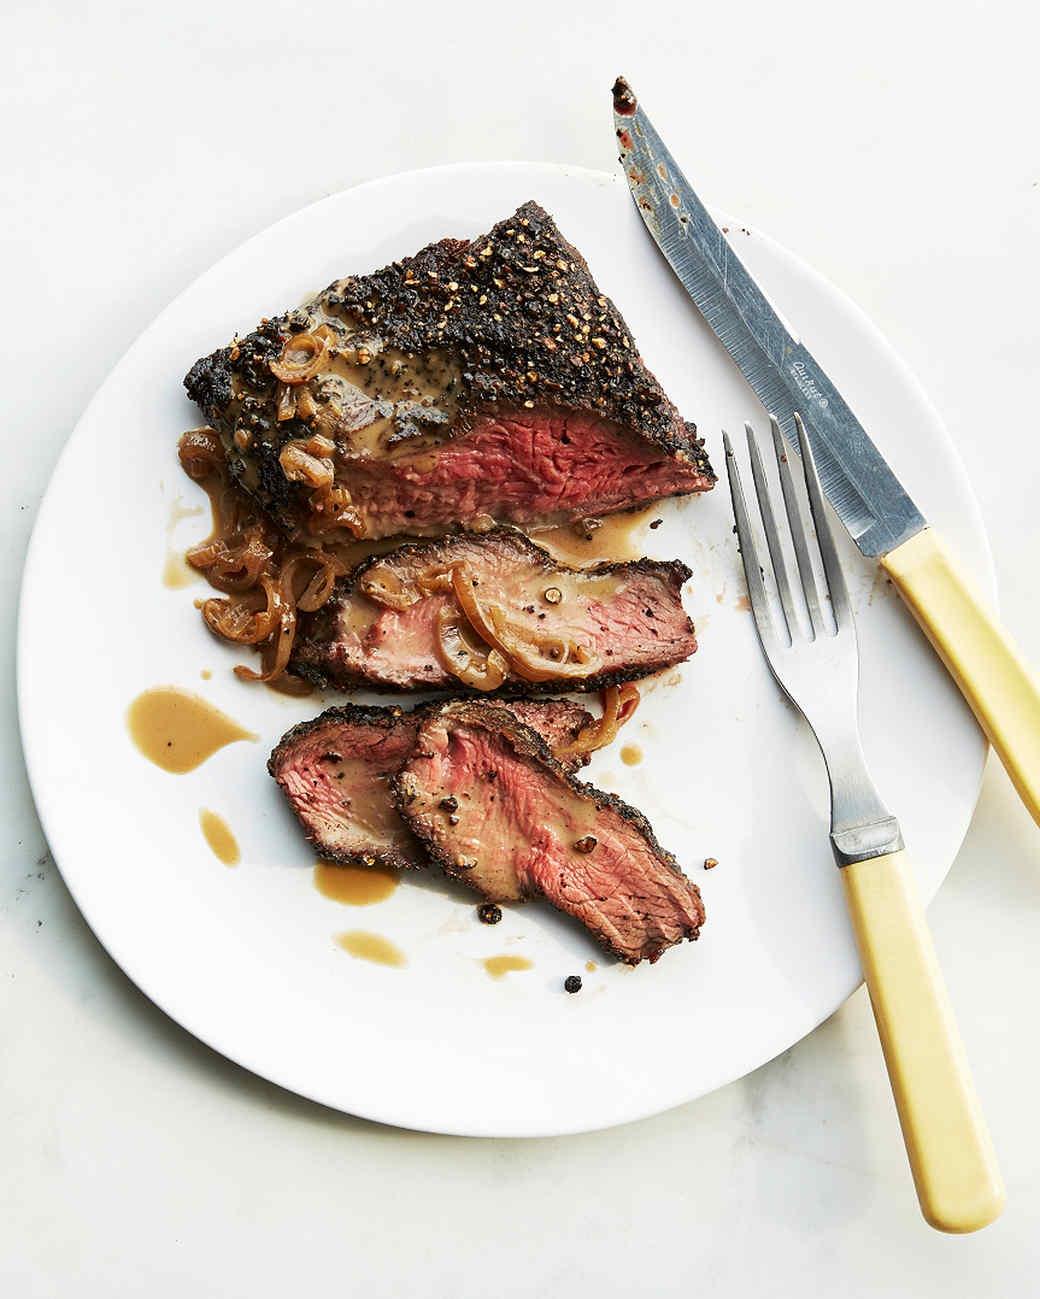 steak-au-poivre-014-d113087.jpg